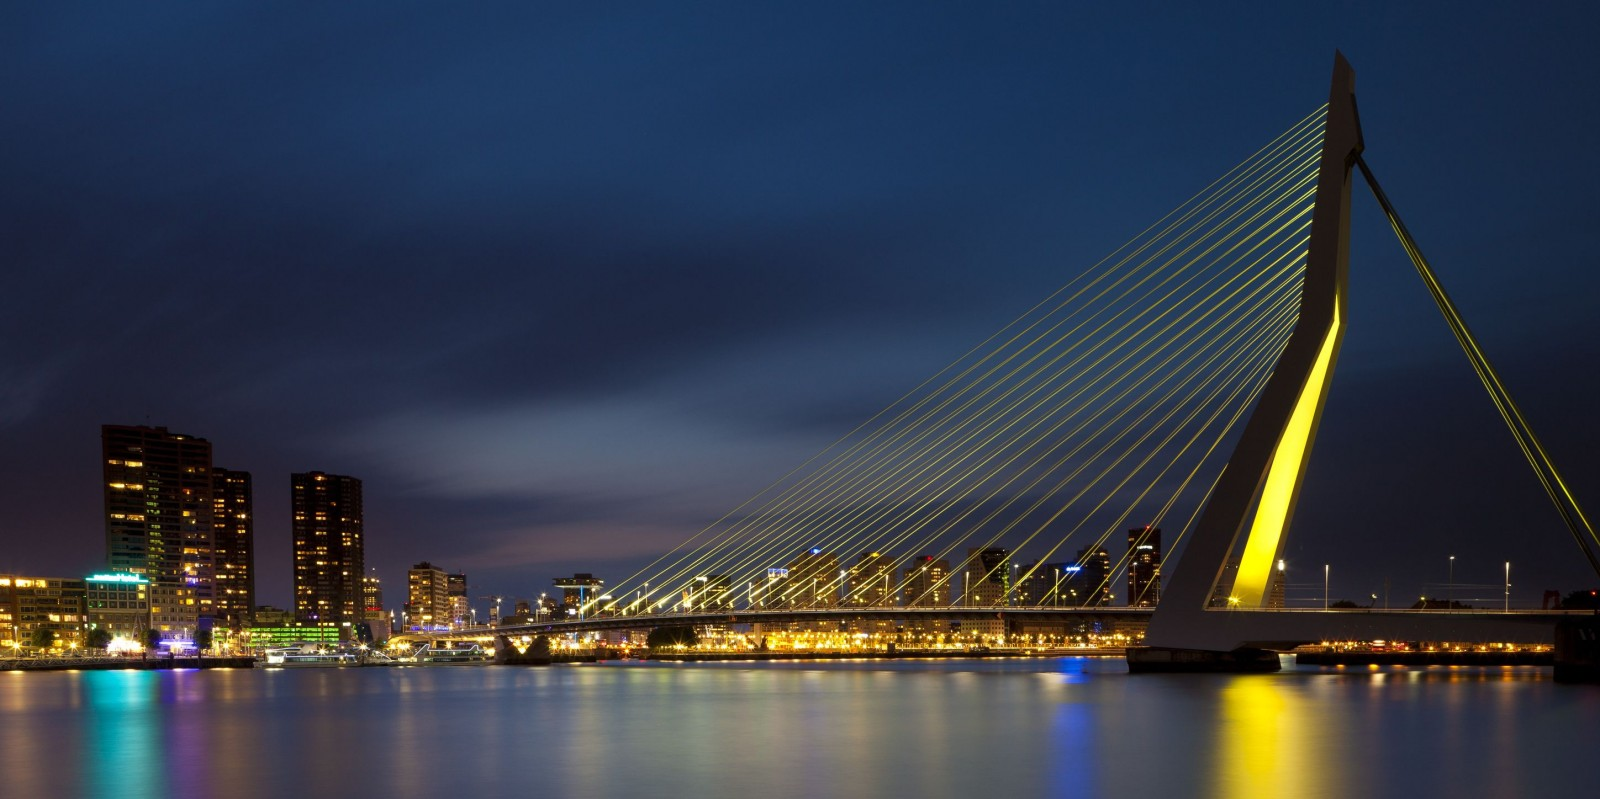 Let's enjoy the beauty: The World's Most Beautiful Bridges